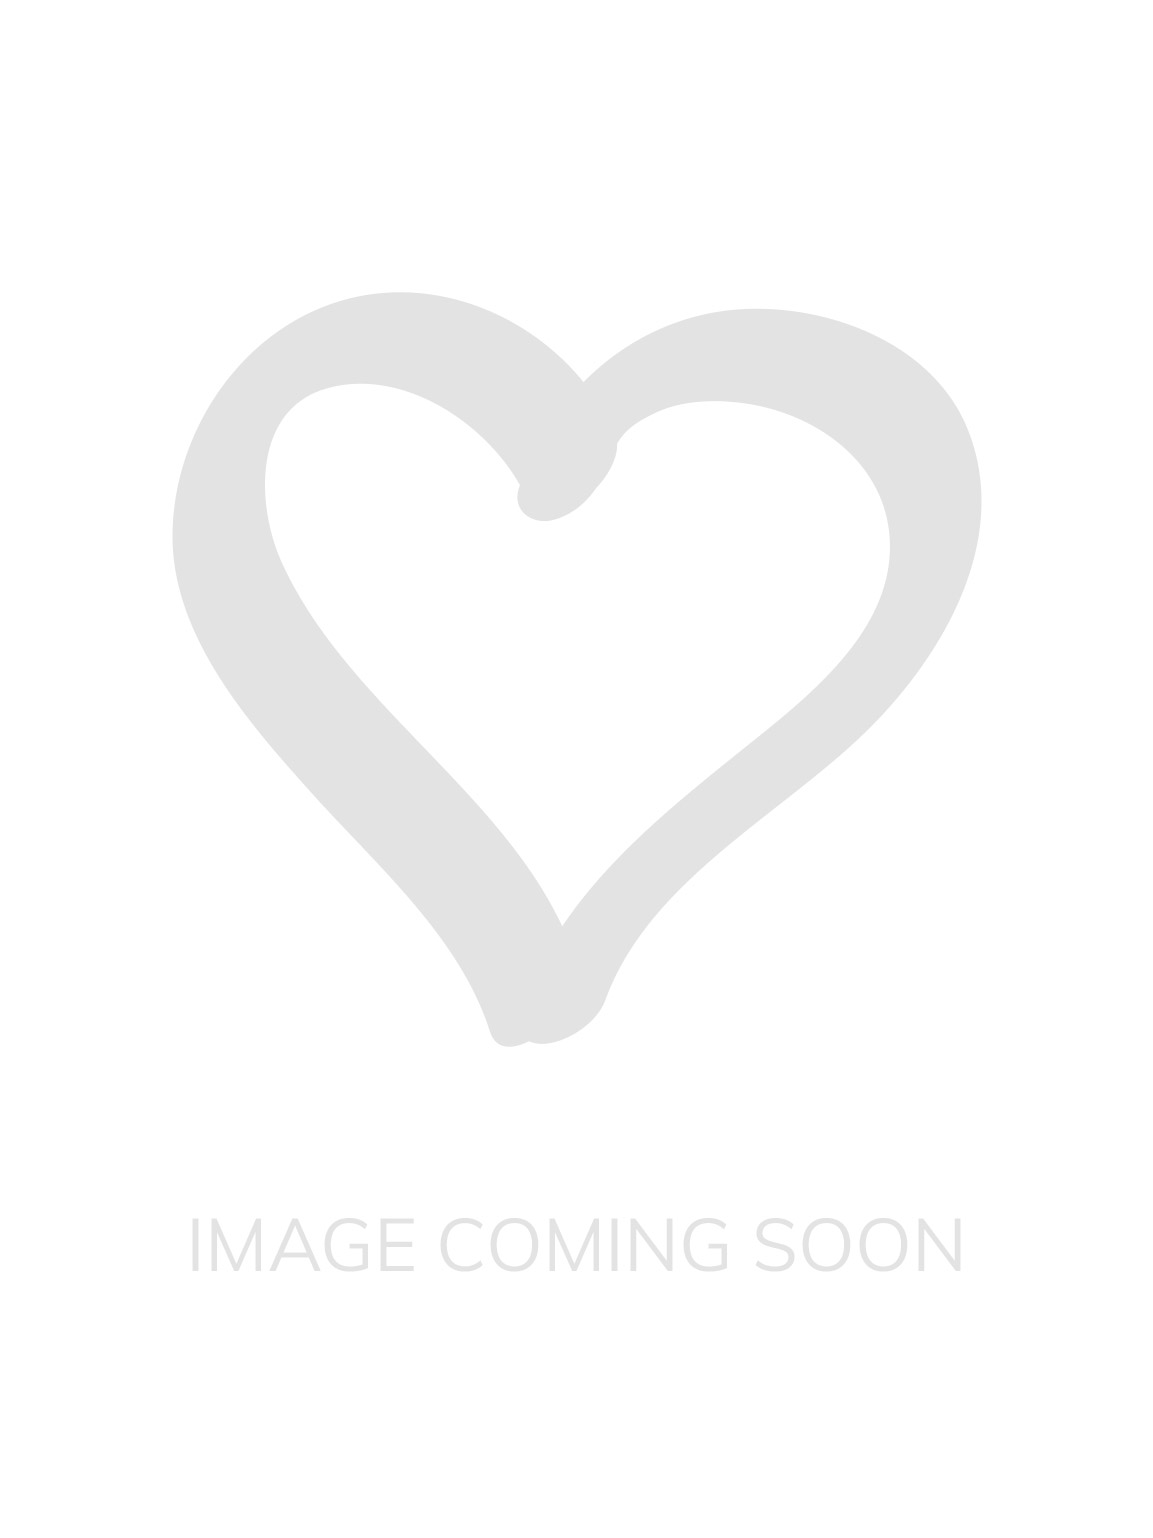 d9fb0a7b34 Sundance Halterneck Bikini Top - Flamingo | Lingerie Outlet Store